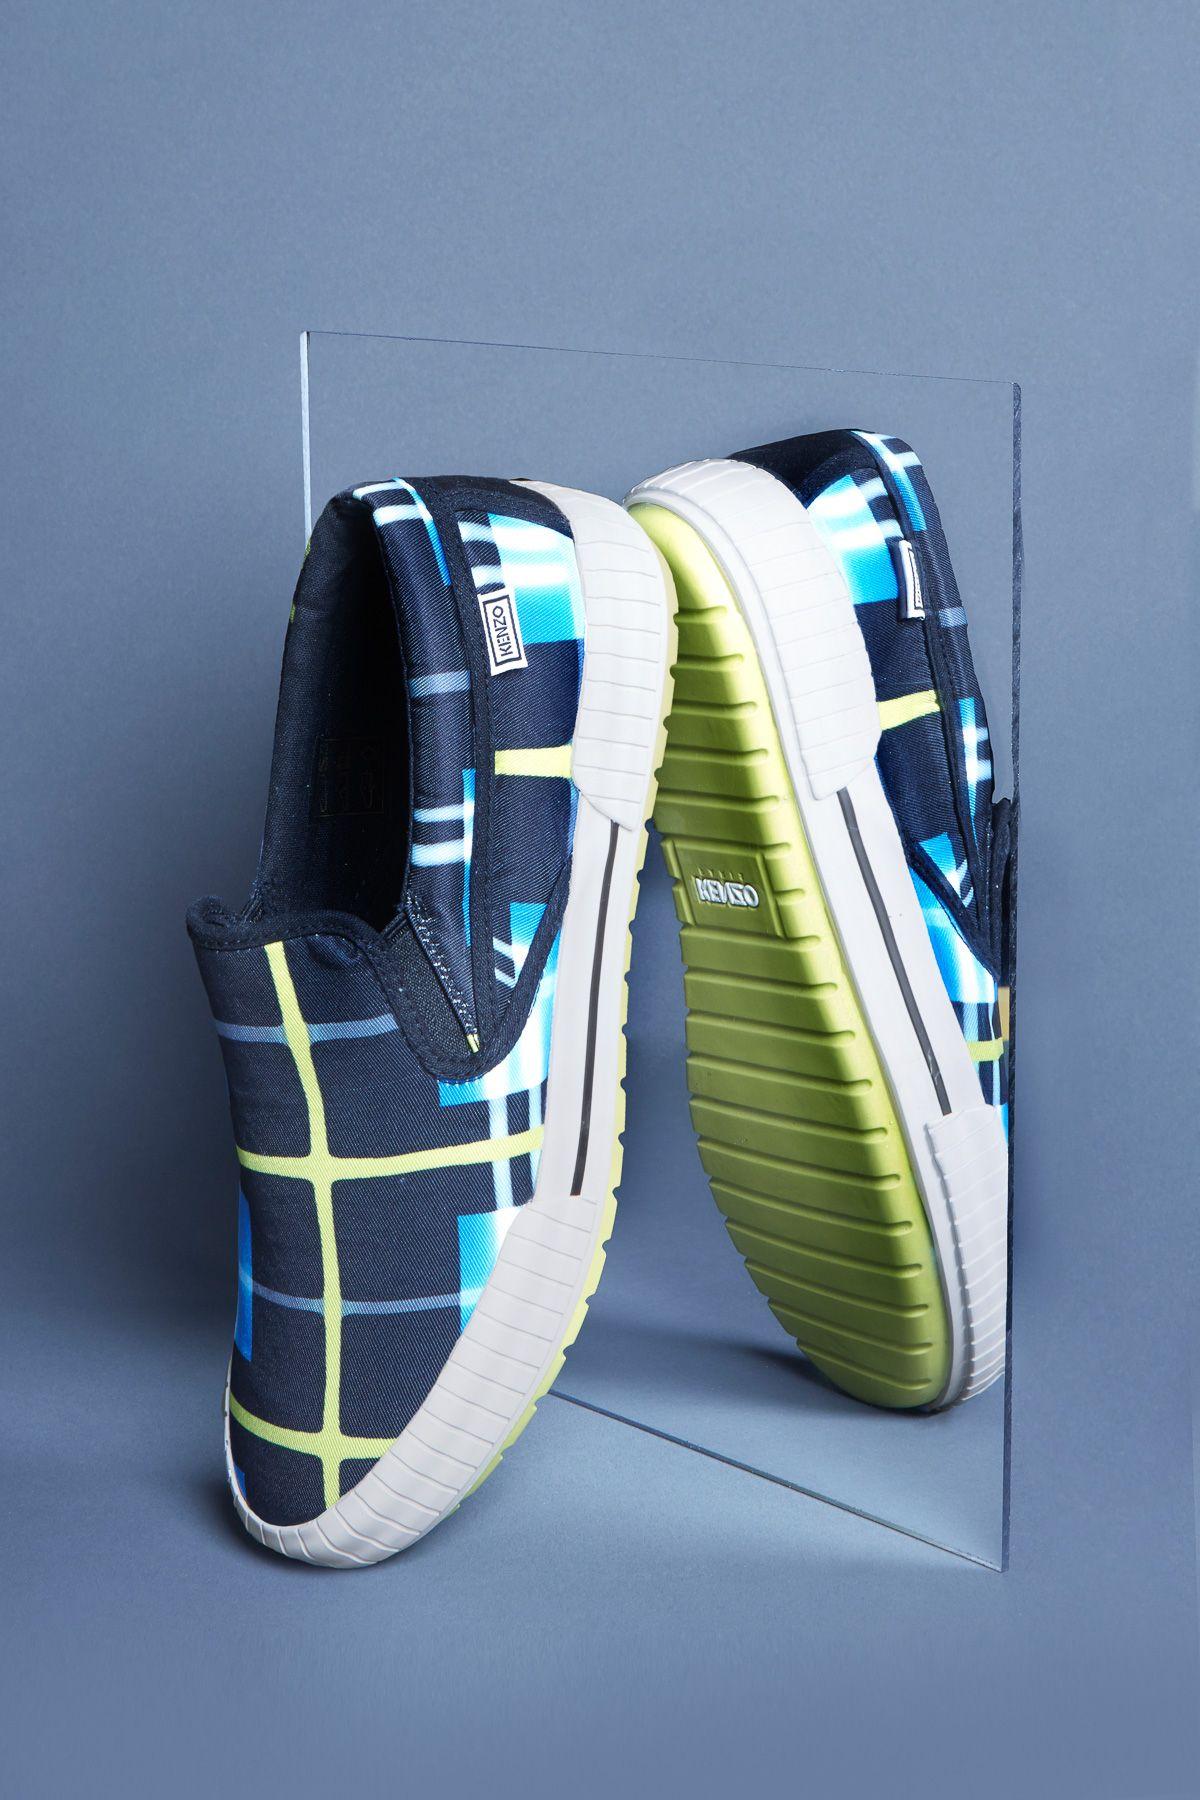 Kenzo Mixed Print Running Sneakers - MEN - Footwear - Kenzo - OPENING CEREMONY